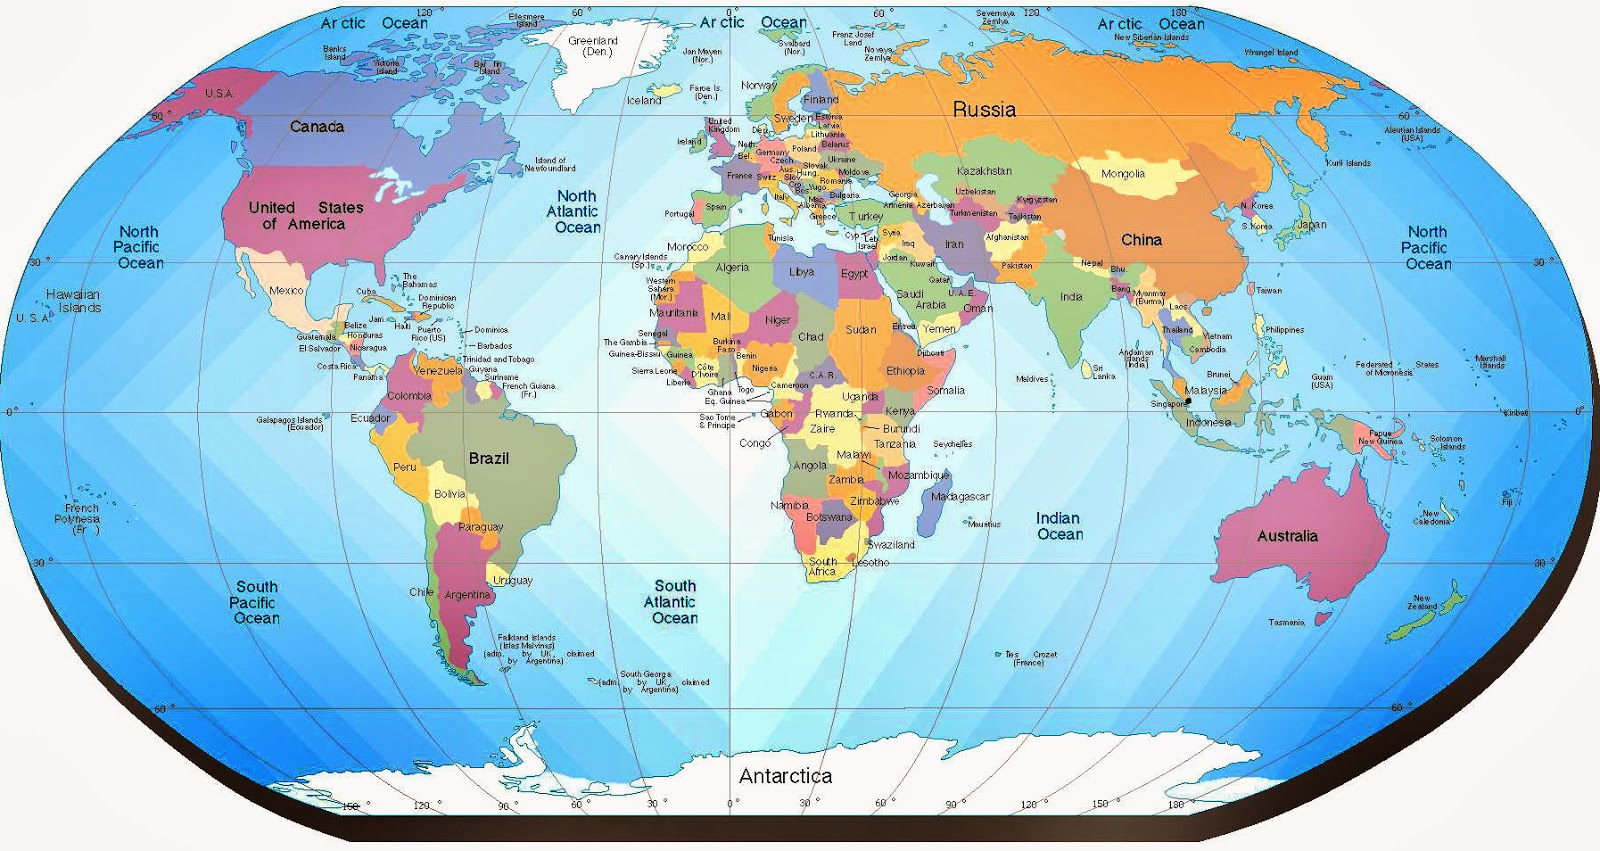 Mapa mundial con nombres